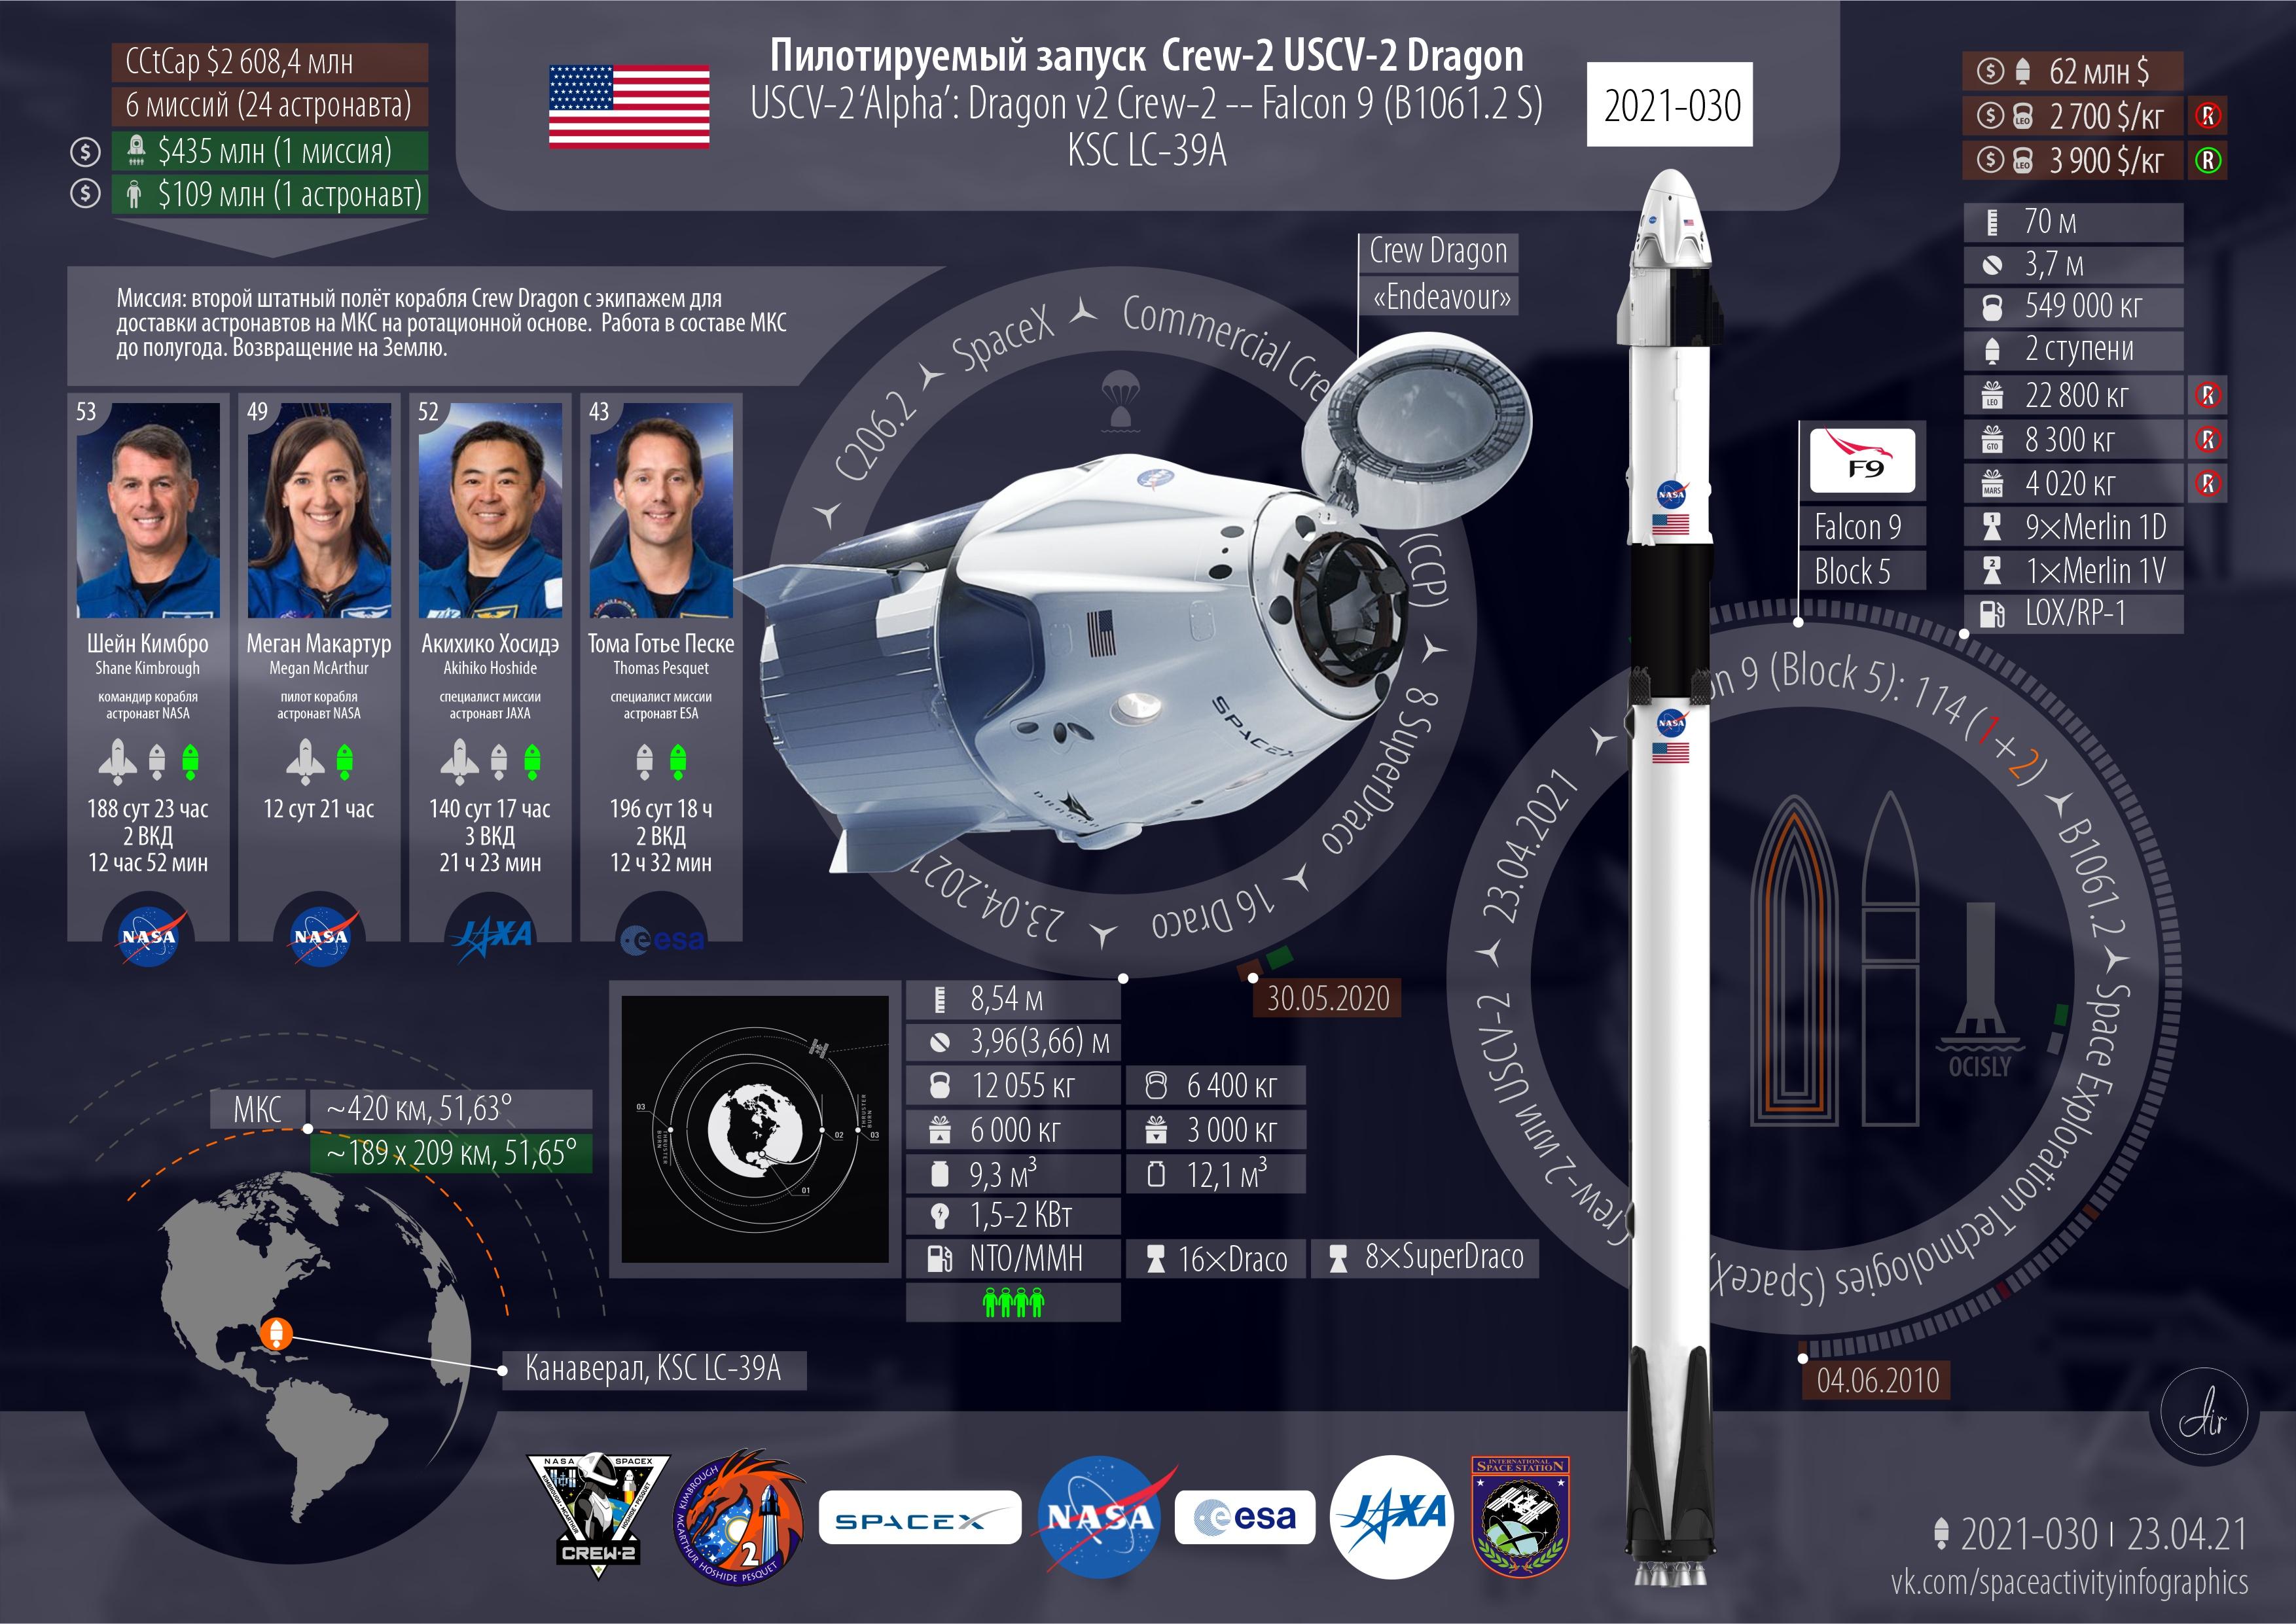 Инфографика текущего запуска Falcon 9 / Crew -2.